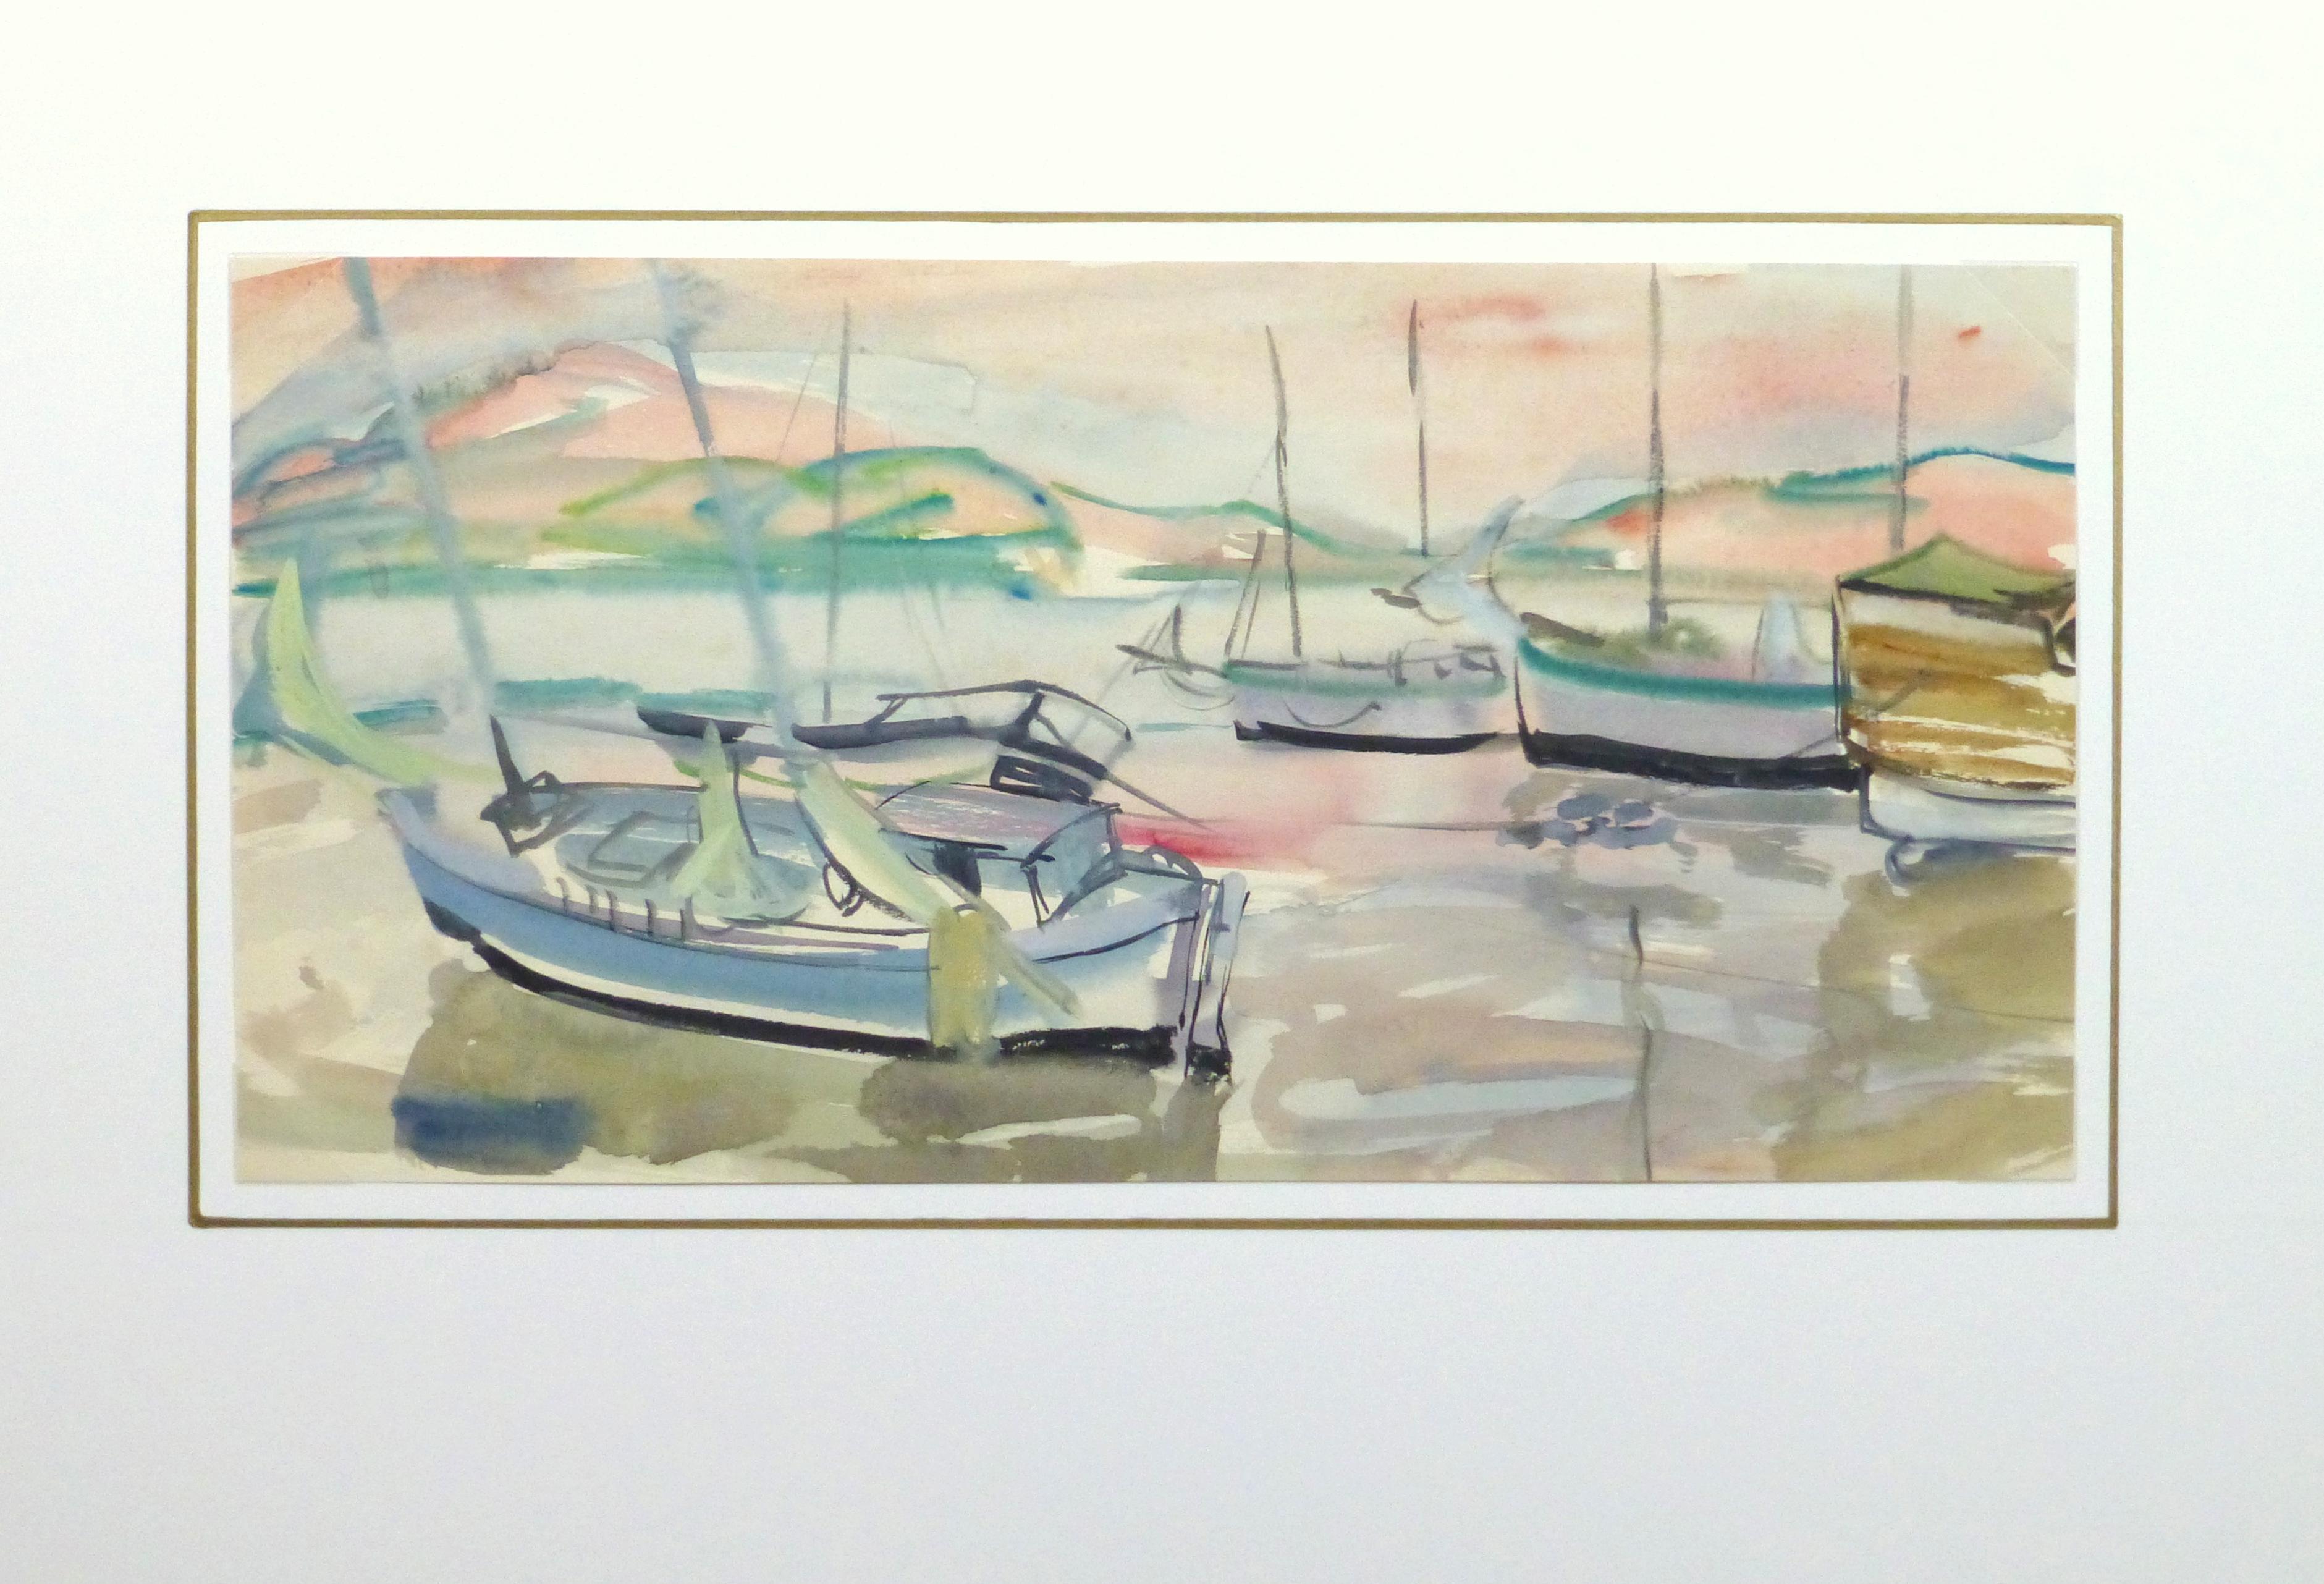 Watercolor Landscape - Sunset harbor, Circa 1950-matted-10396M